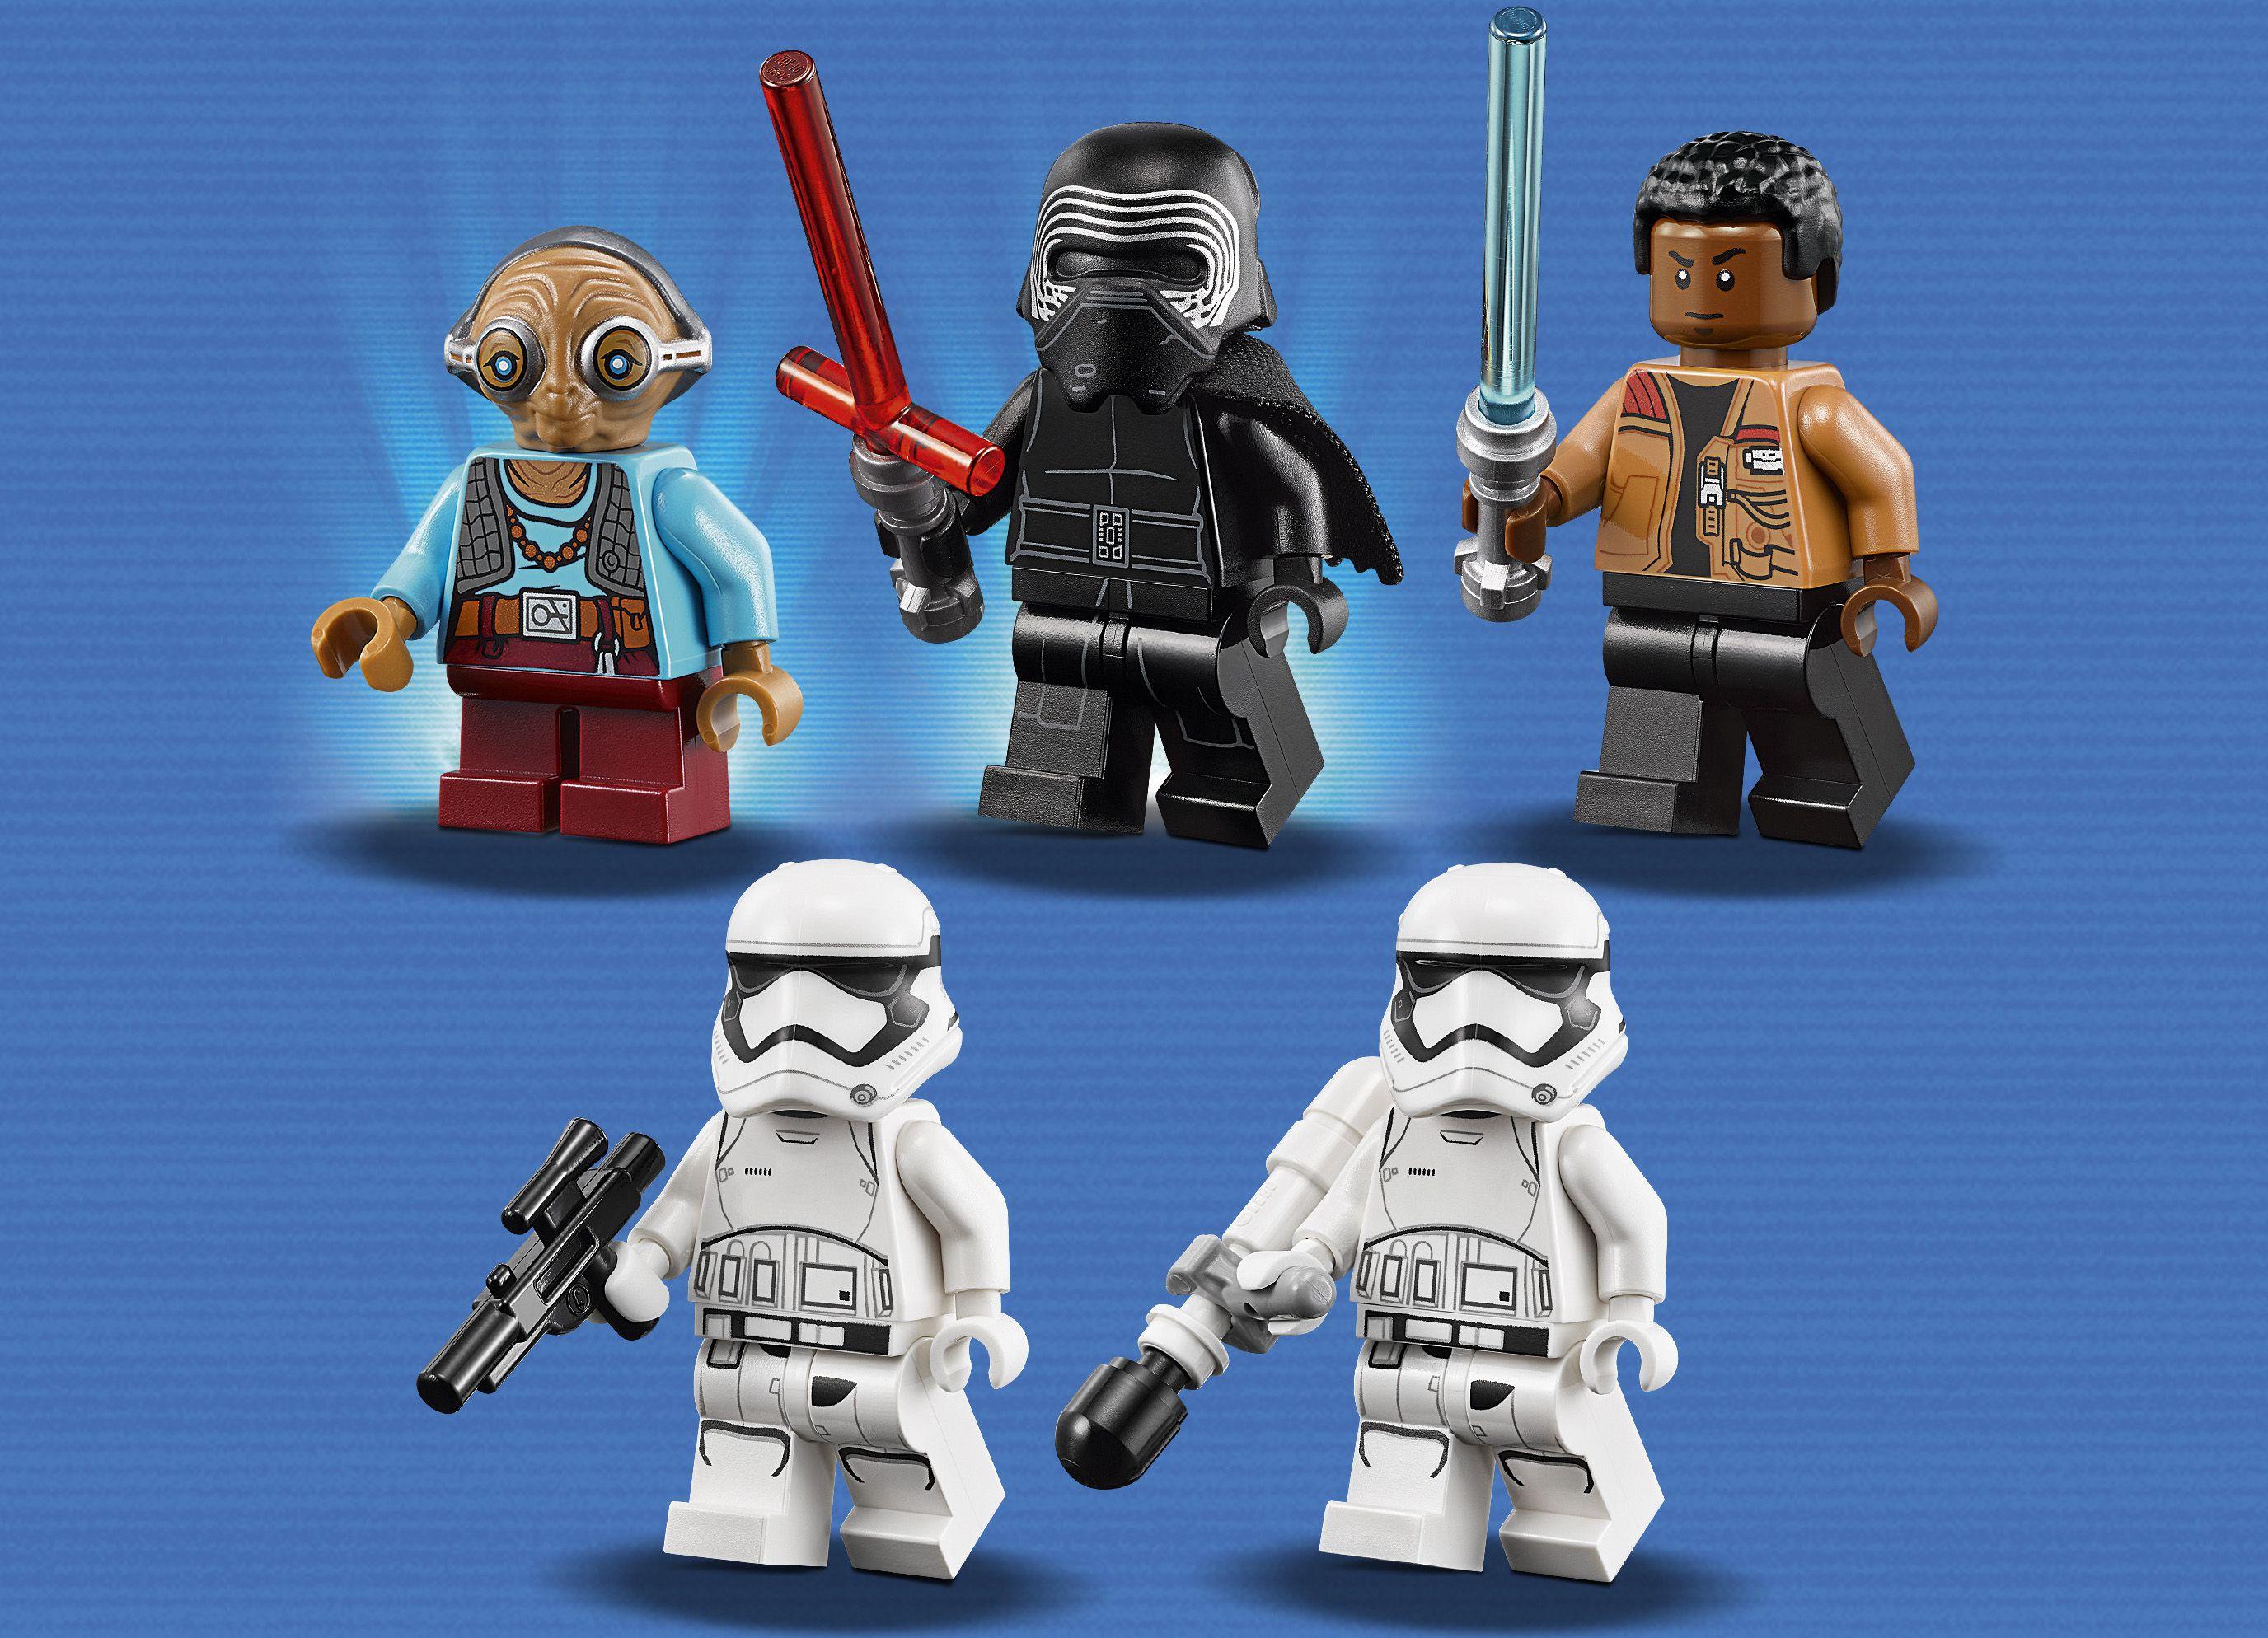 Star Lego® Lego® Star Lego® Lego® Wars Lego® Wars Wars Star Wars Star n0m8vNOw